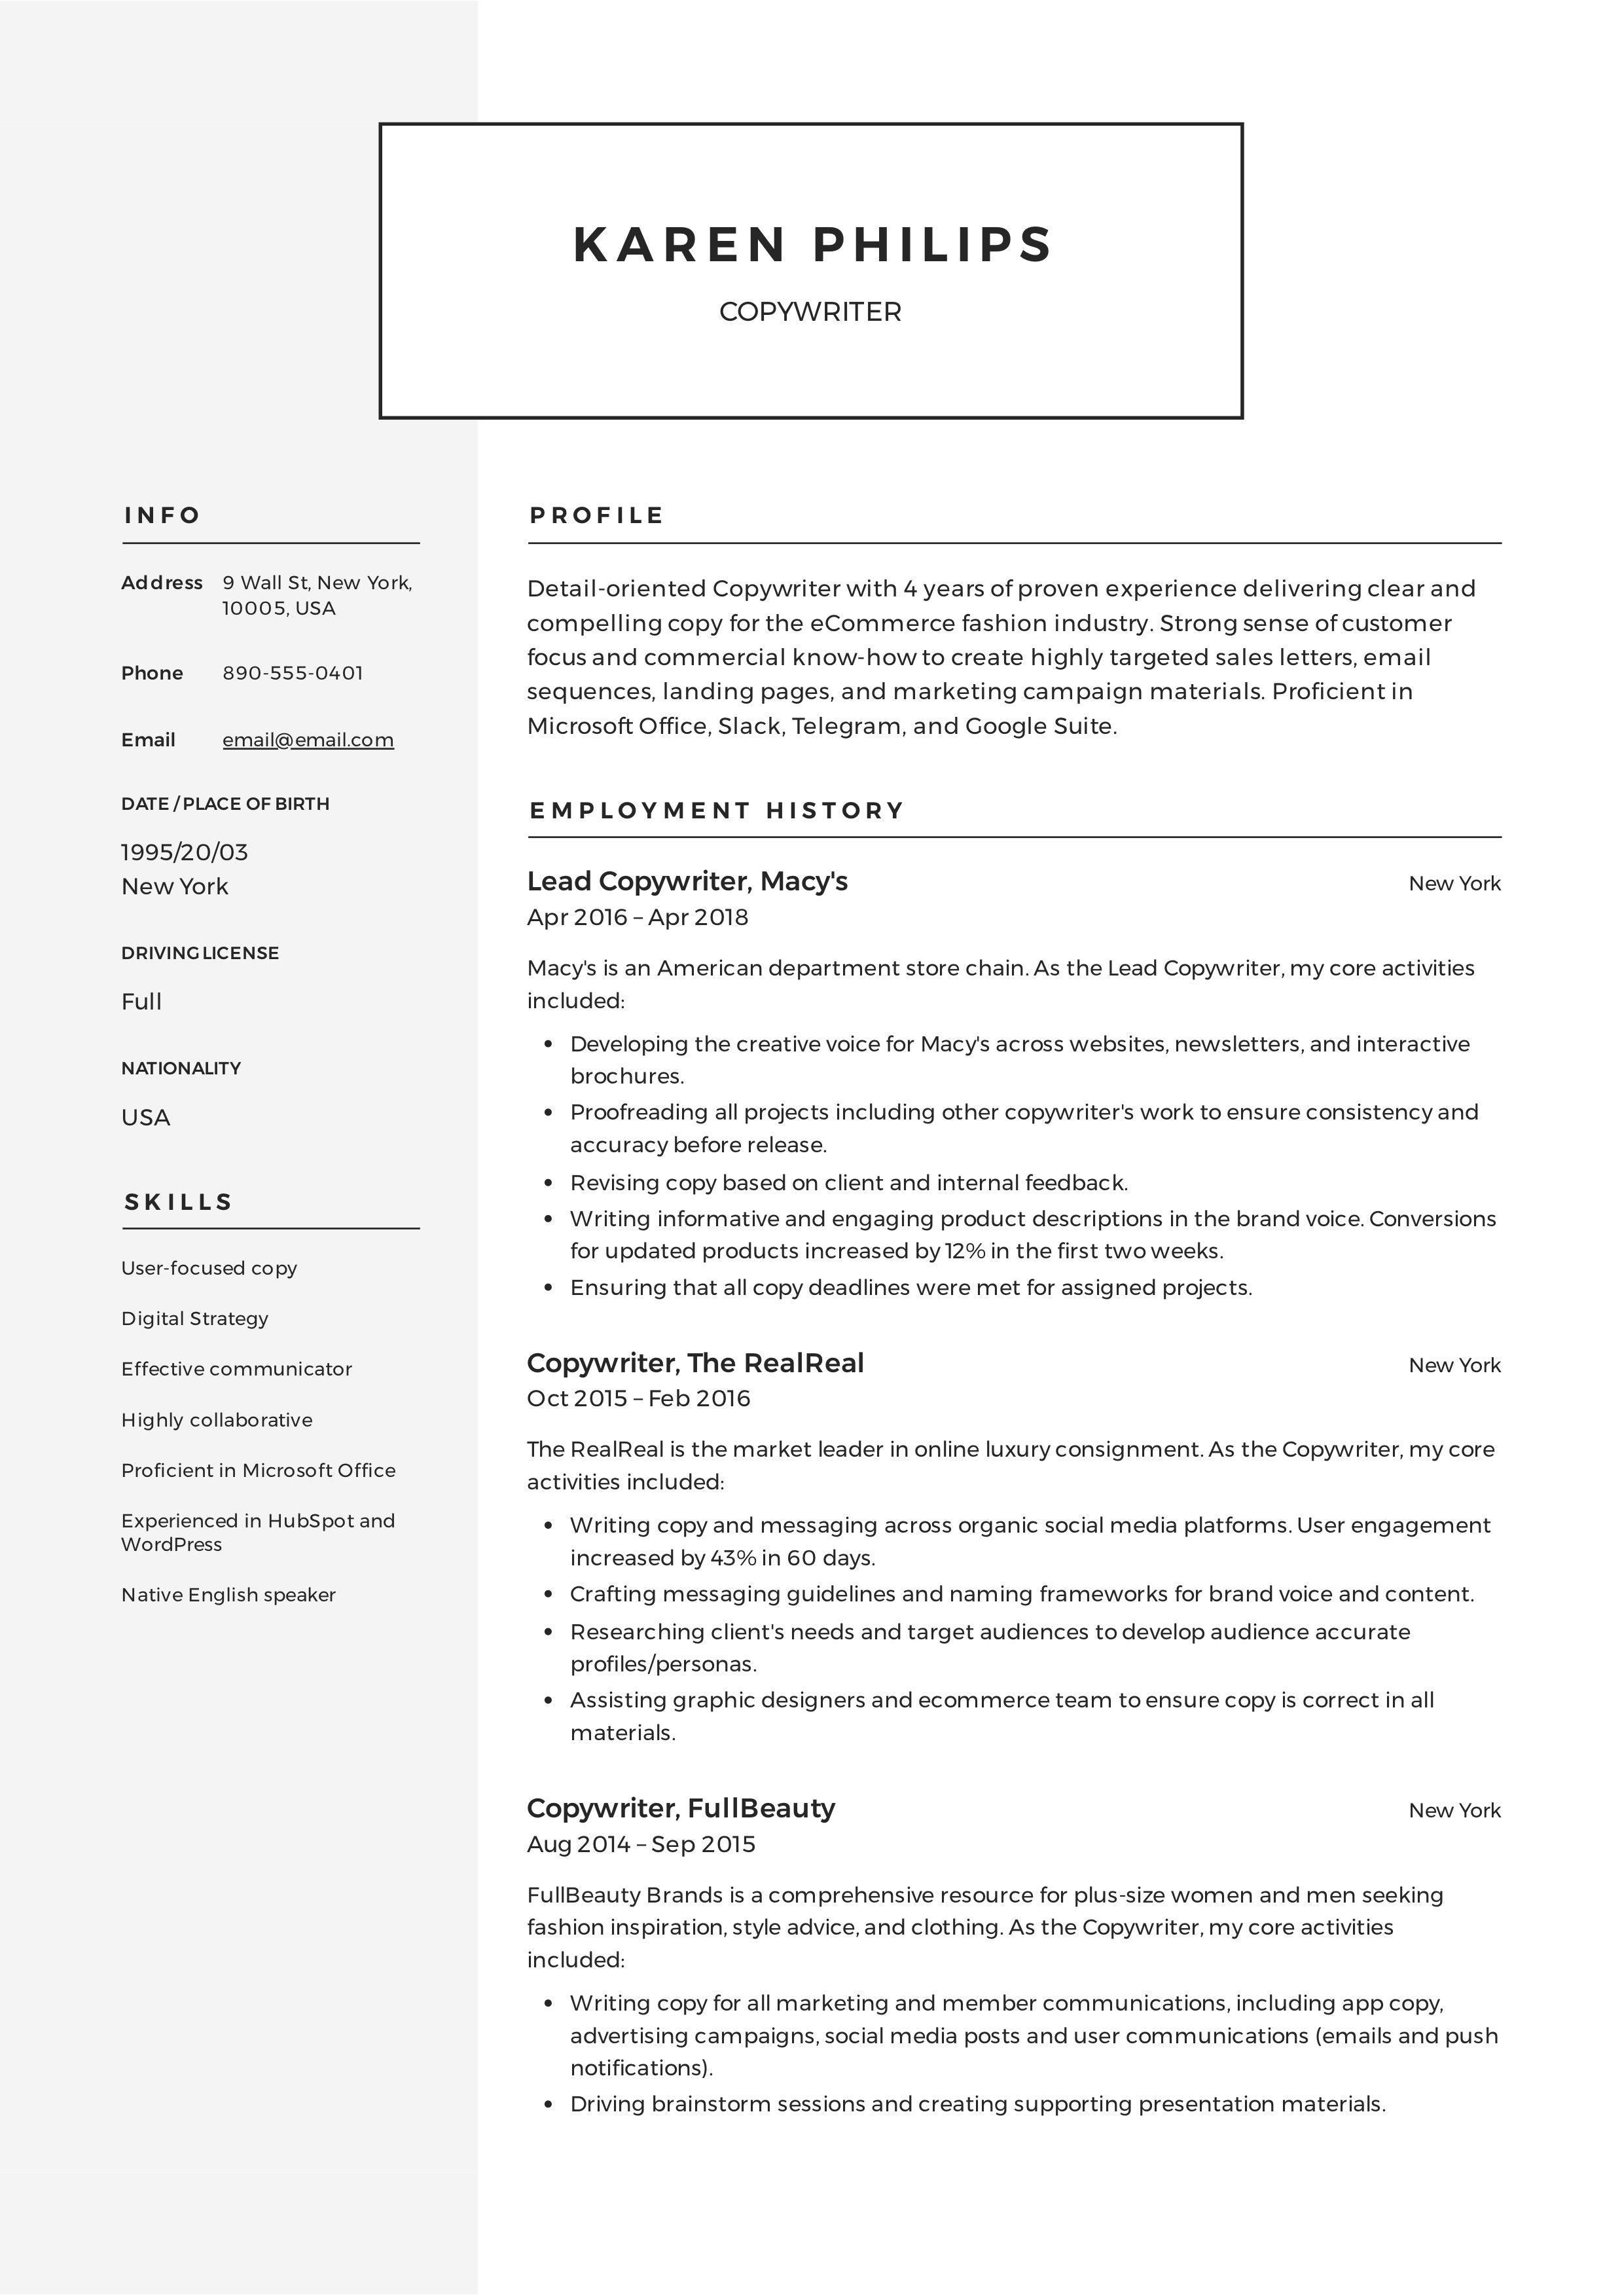 Copywriter Resume & Writing Guide in 2020 Web designer